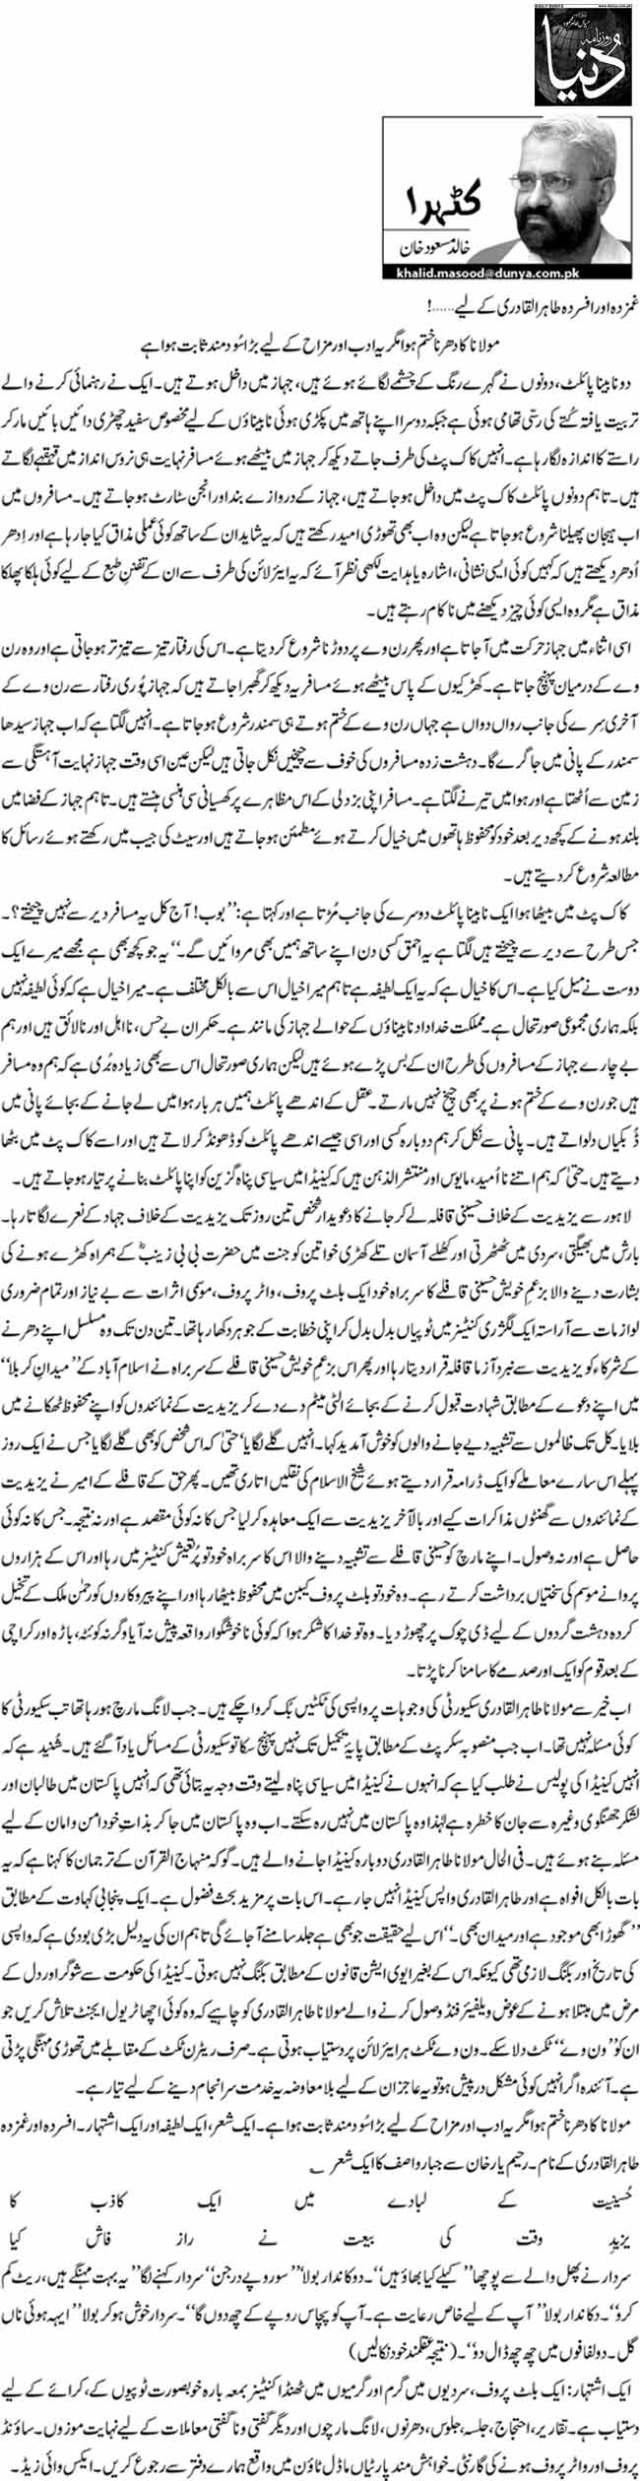 Ghamzada aur Afsurda Tahir ul Qadri k liay...! - Khalid Masood Khan